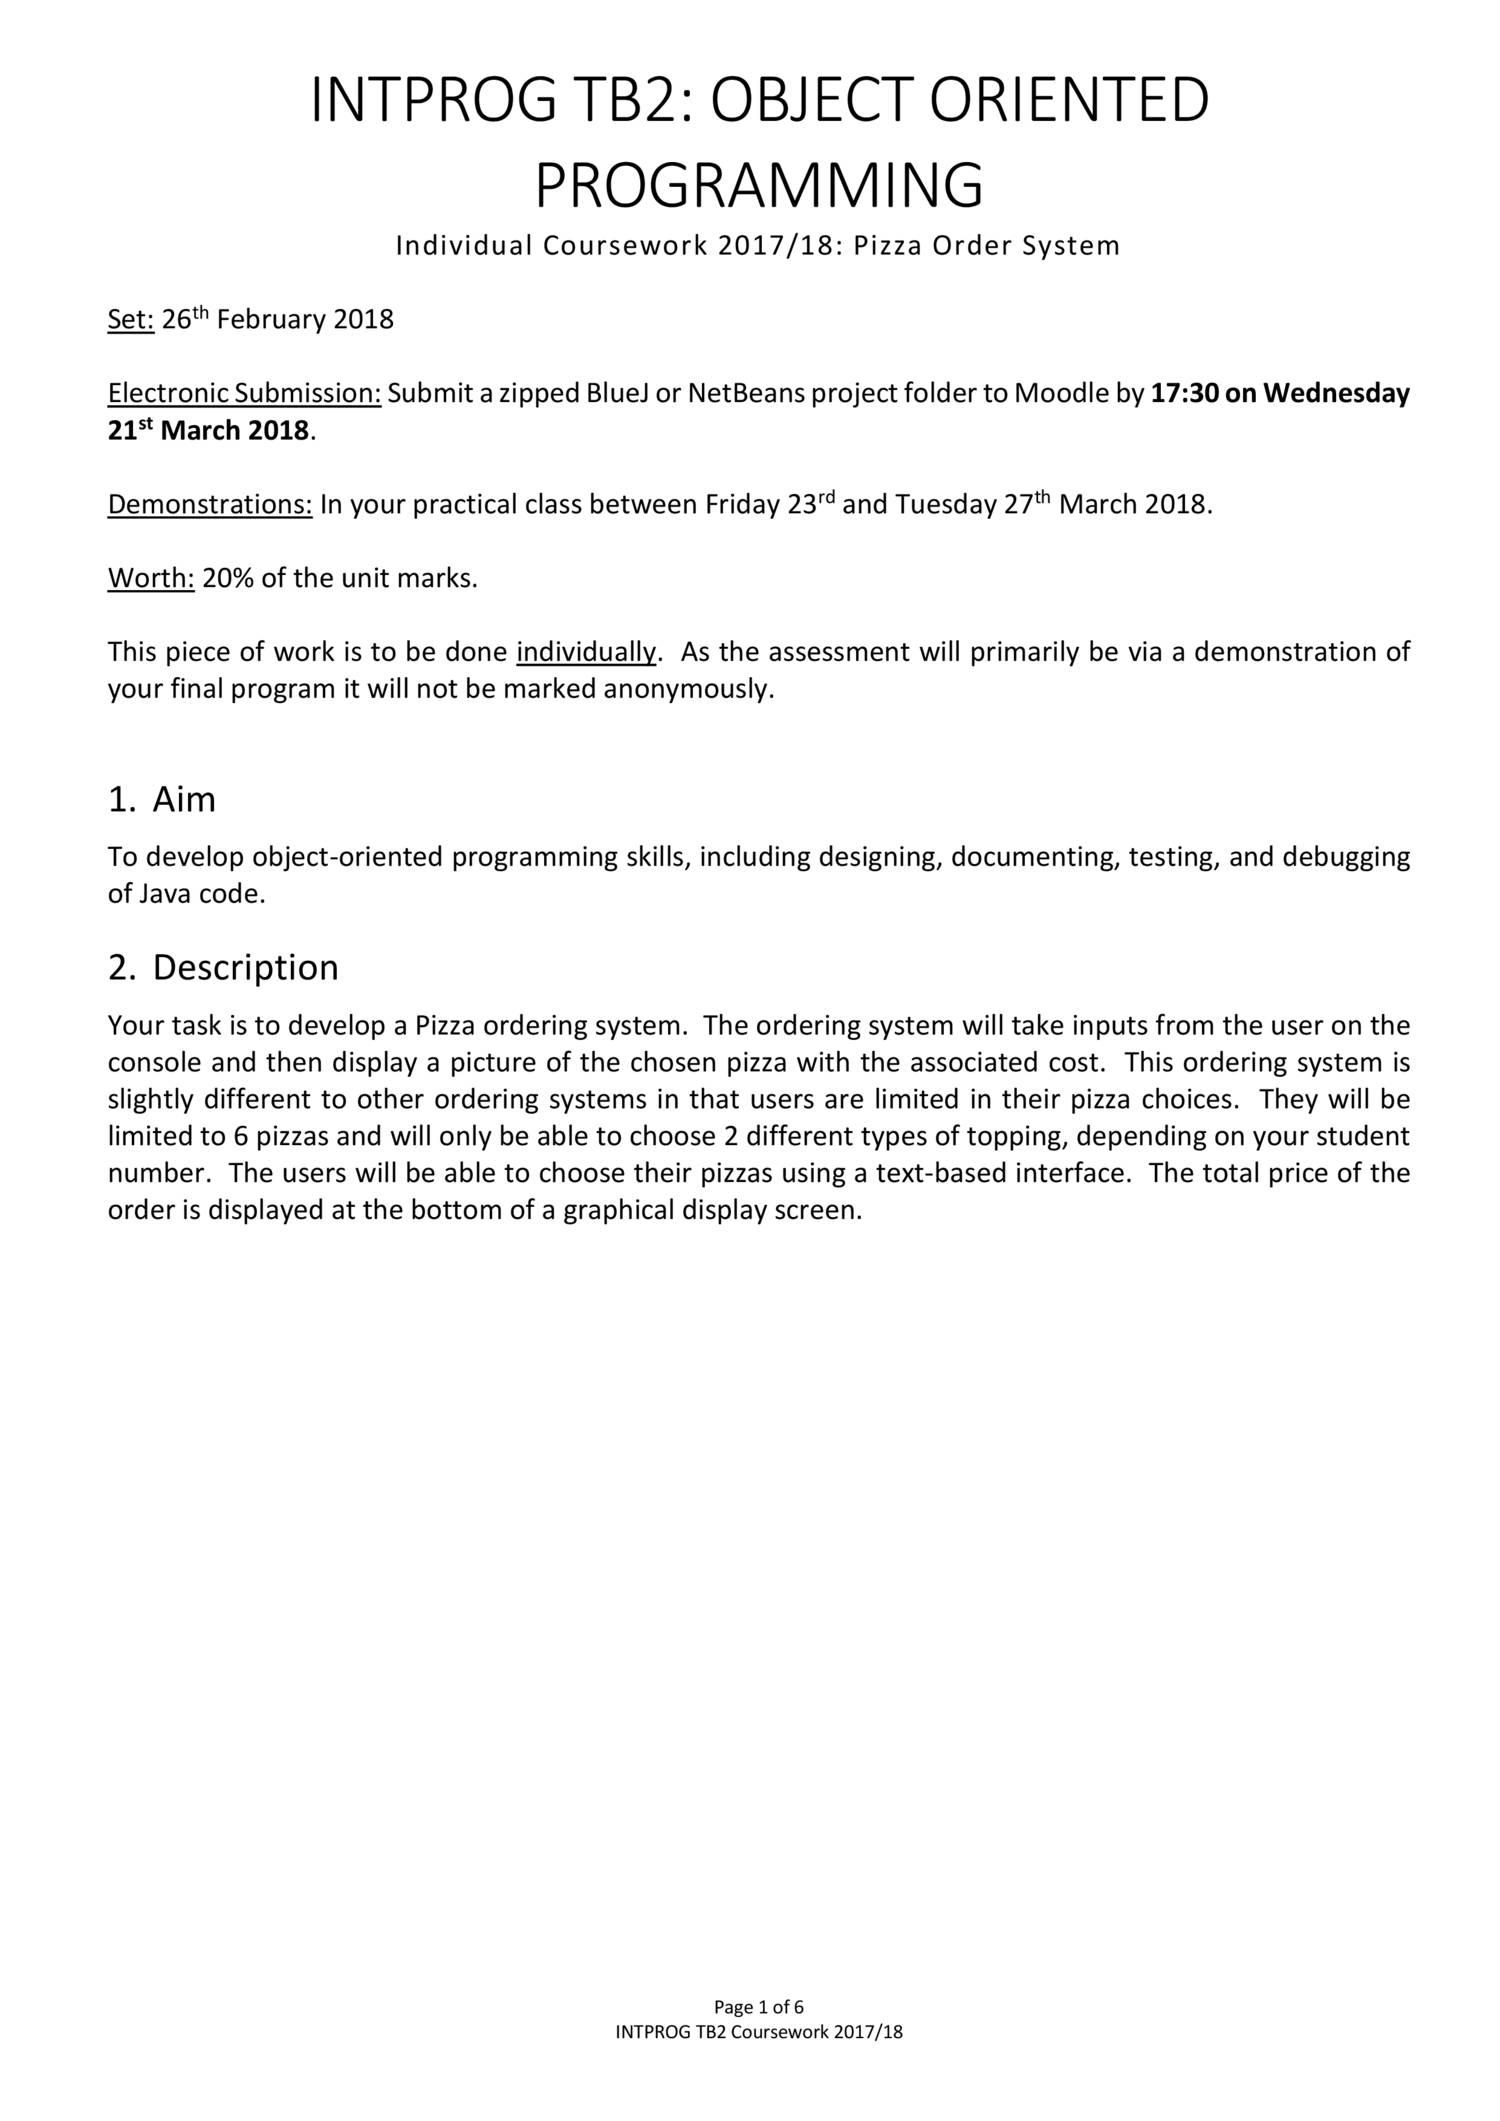 INTPROG TB2 Java Coursework pdf | DocDroid